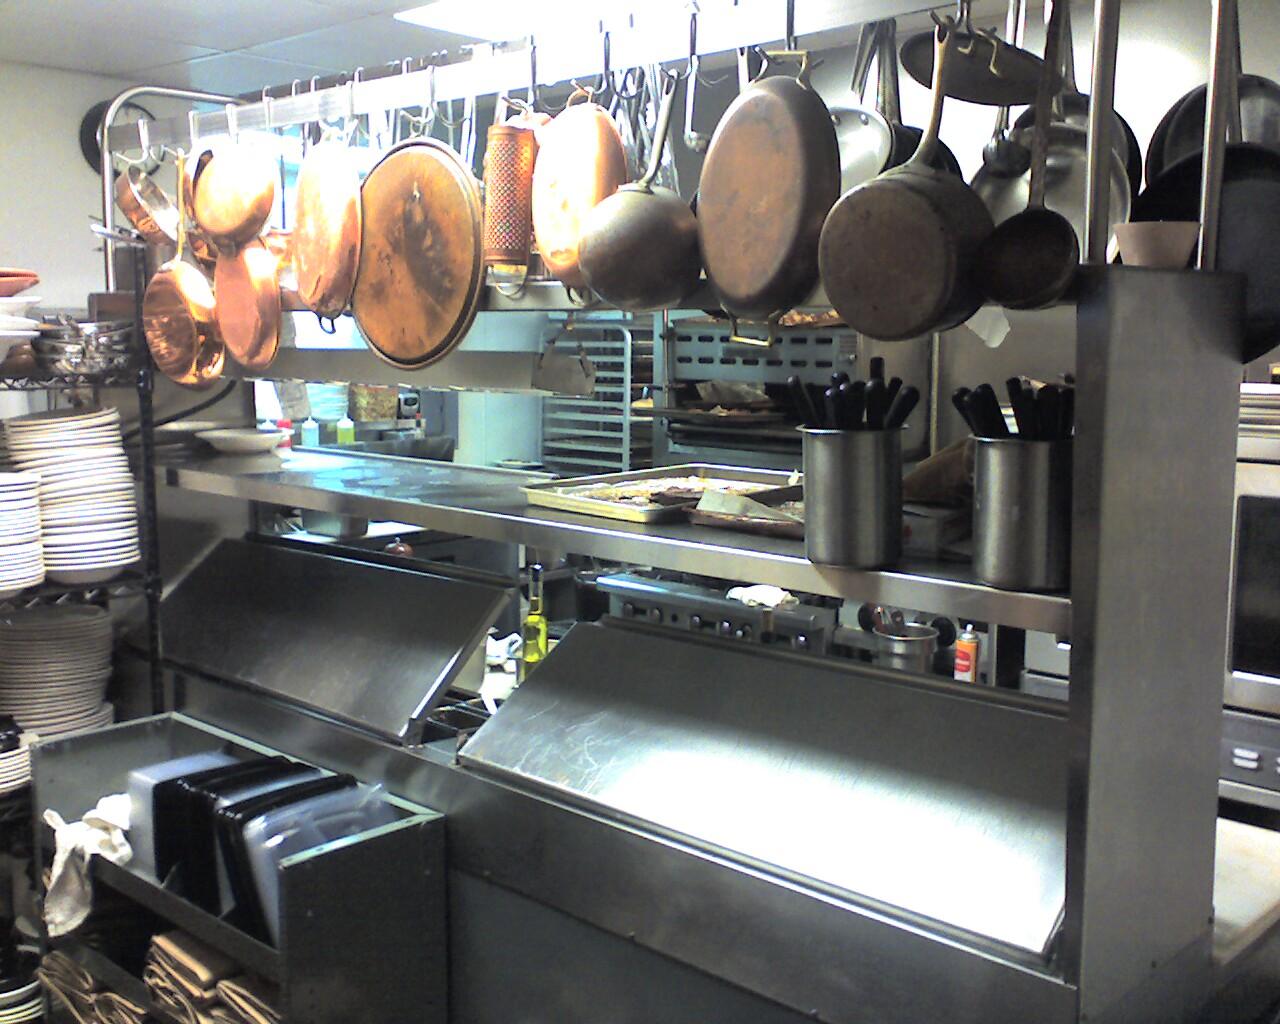 Restaurant Kitchen file:brass sauce pans and pots in italian restaurant kitchen